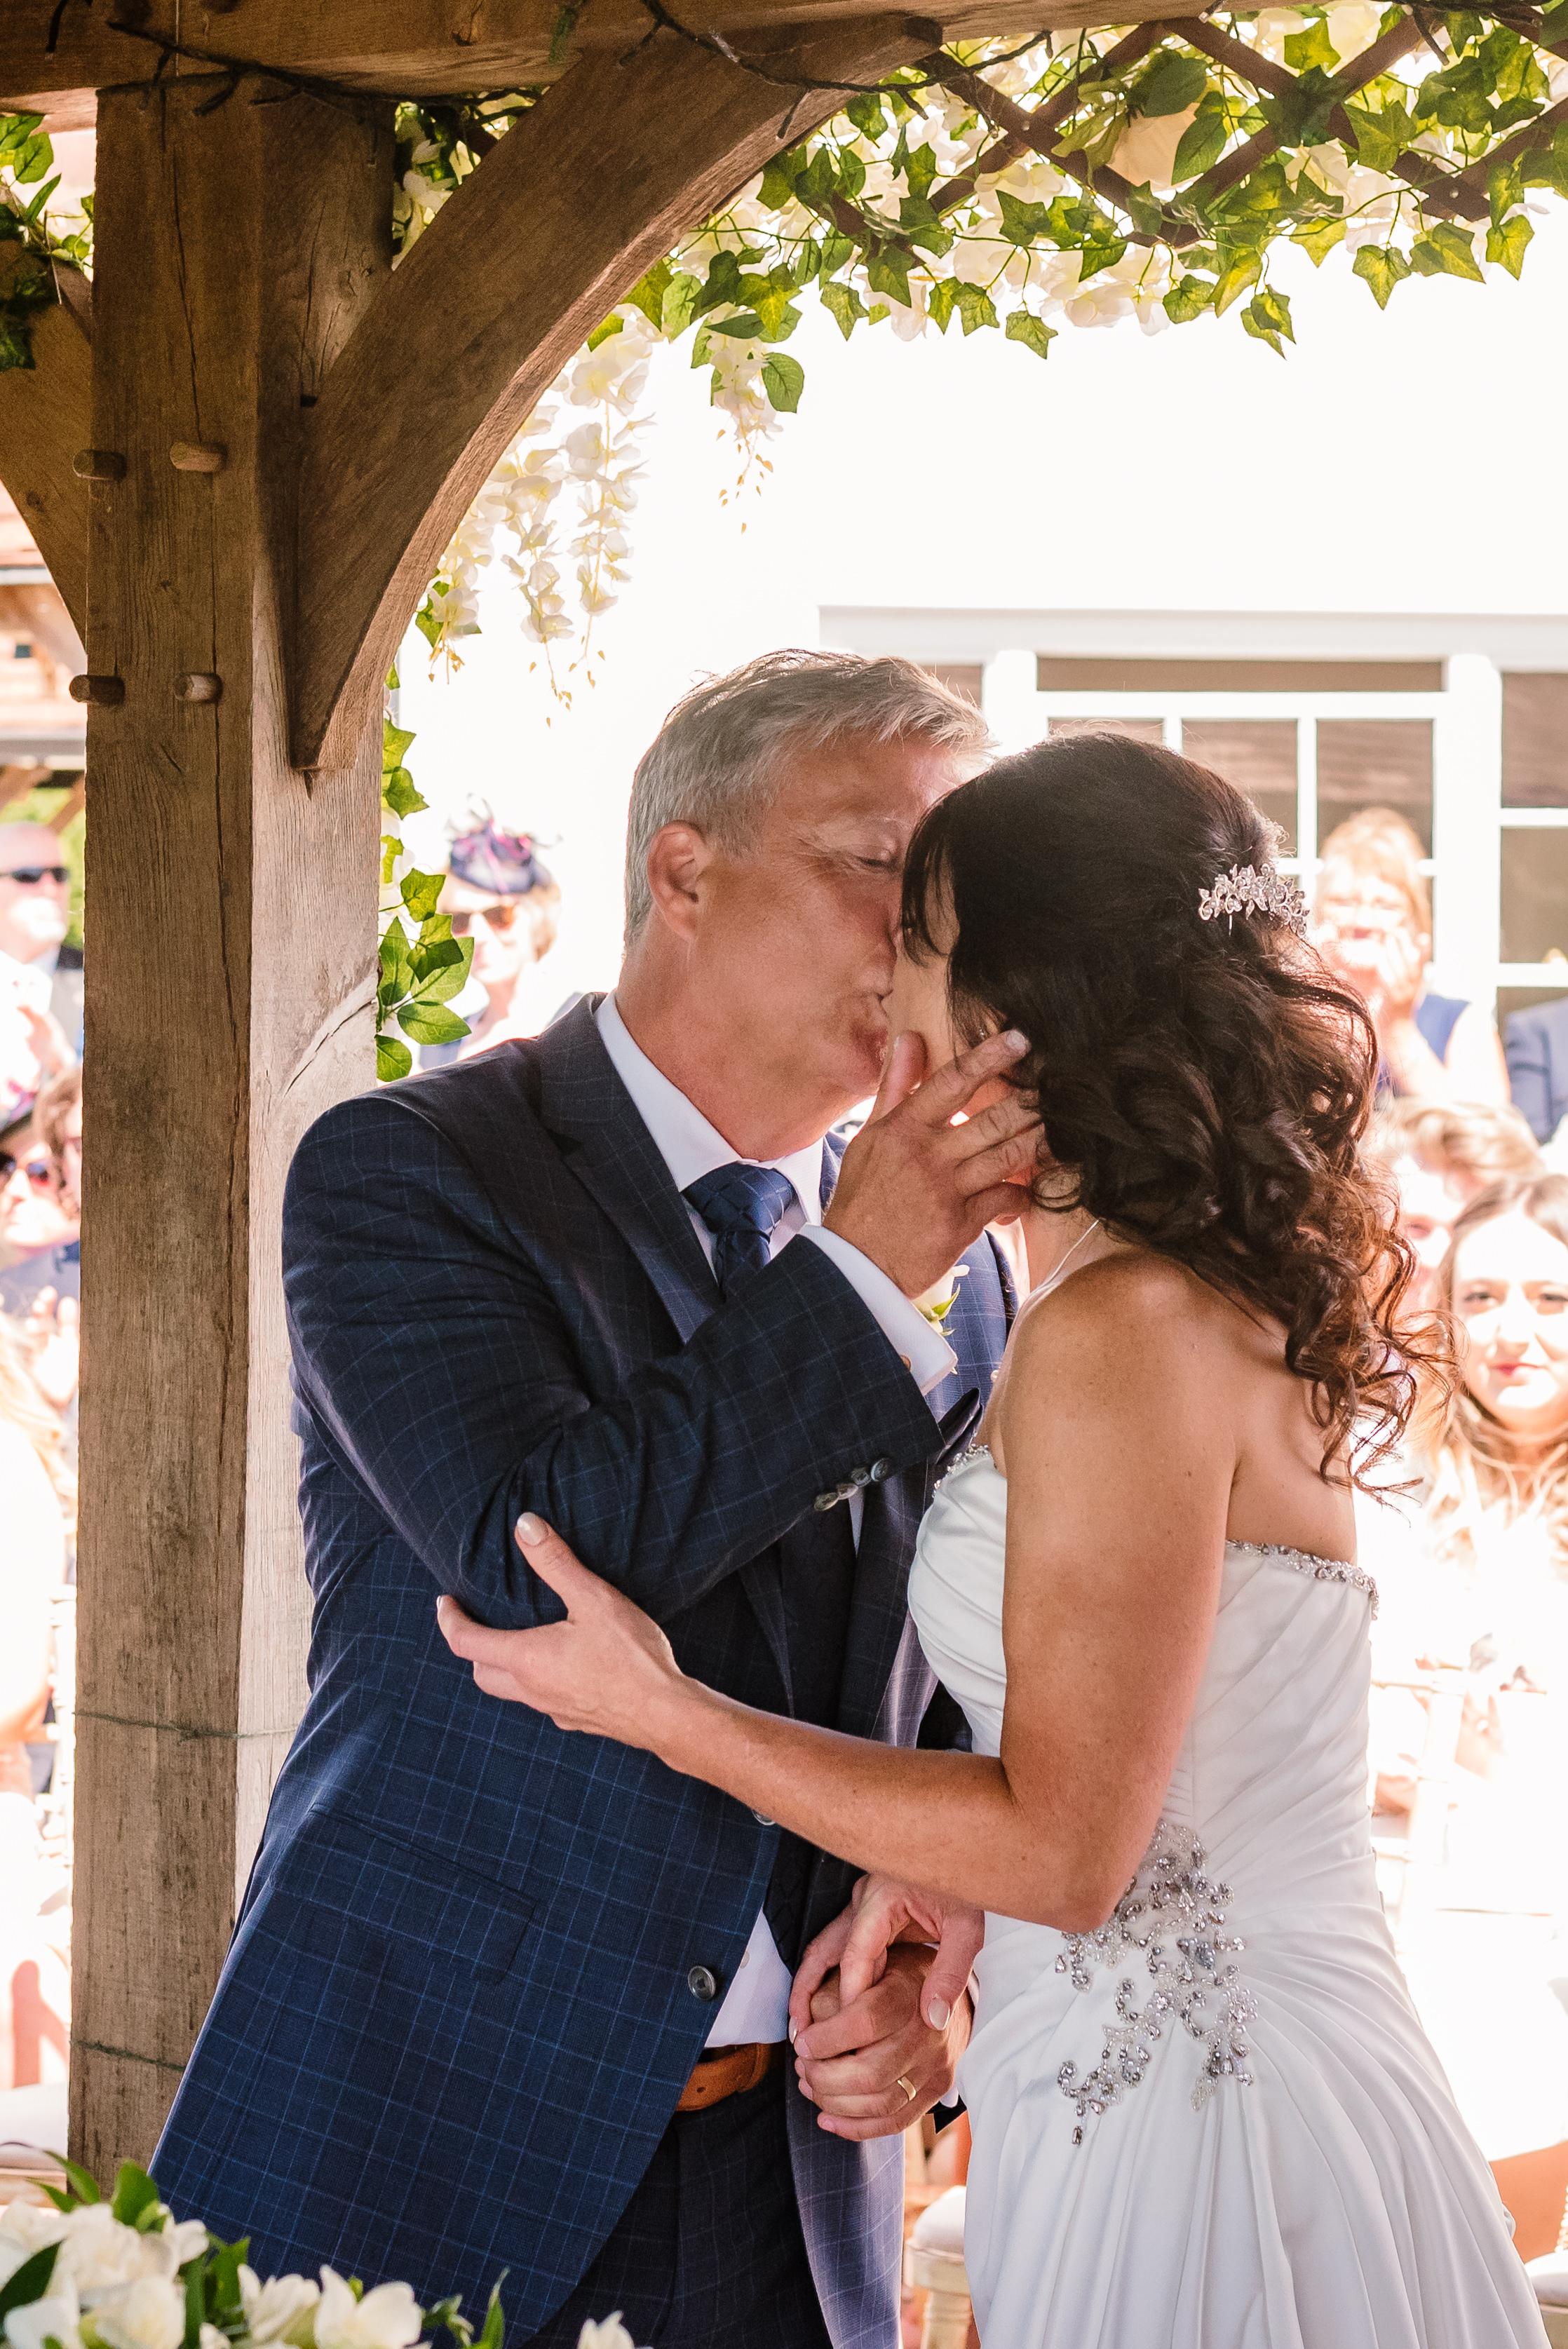 Sarah-Fishlock-Photography / Hampshire-wedding-photographer-Hampshire / Fleet-Wedding-Photographer / Groomed-Farm-Wedding-Hampshire / Farm-Wedding-Venues-Surrey / Farm-Wedding-Venues-Hampshire